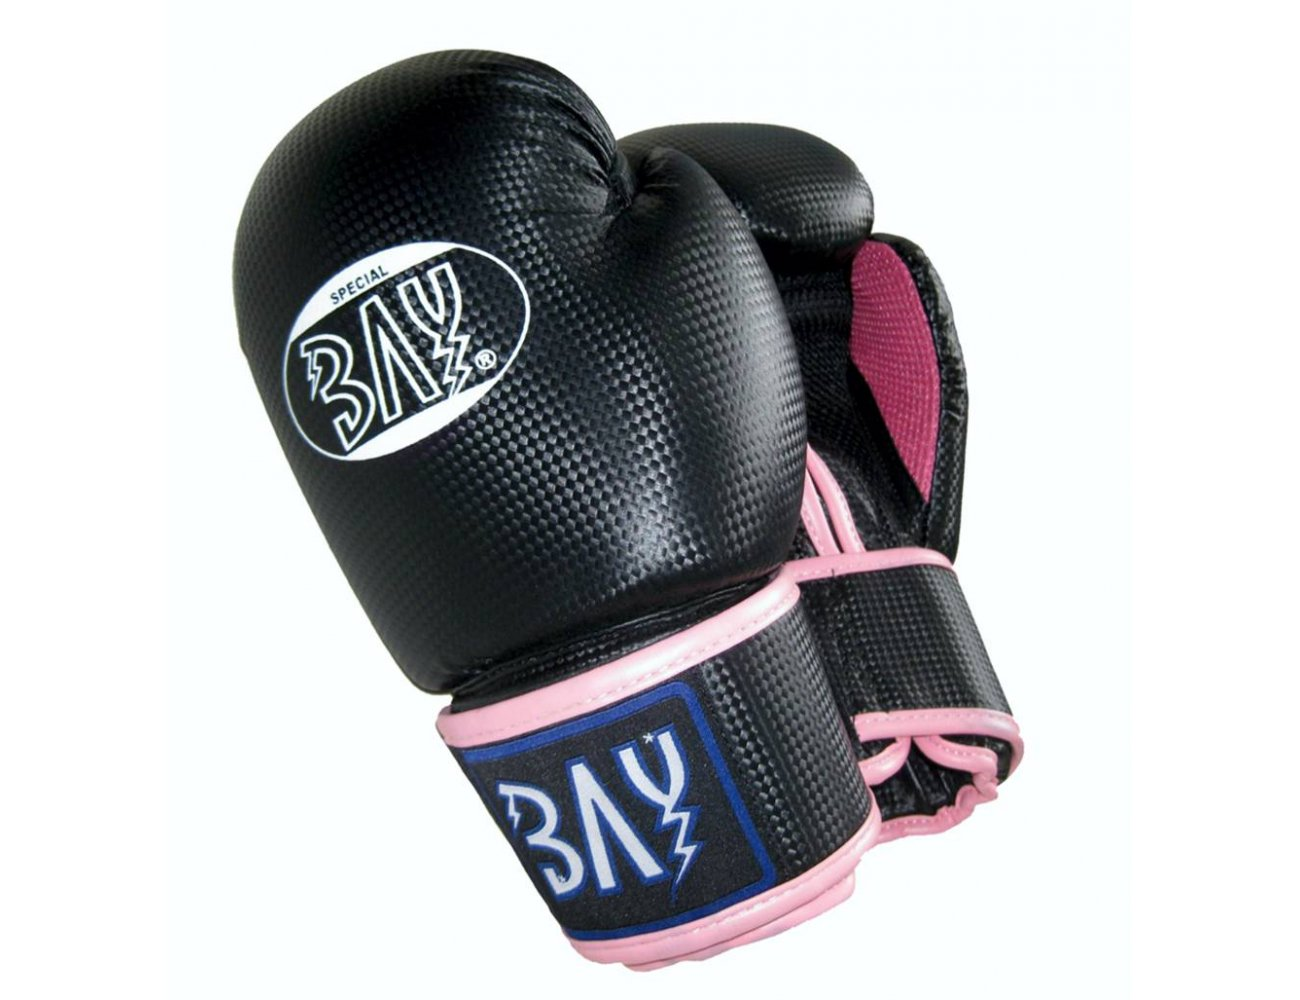 BAY® Camouflage KINDER Kids Boxhandschuhe 8 10 12 Box-Handschuhe Kickboxen Boxen